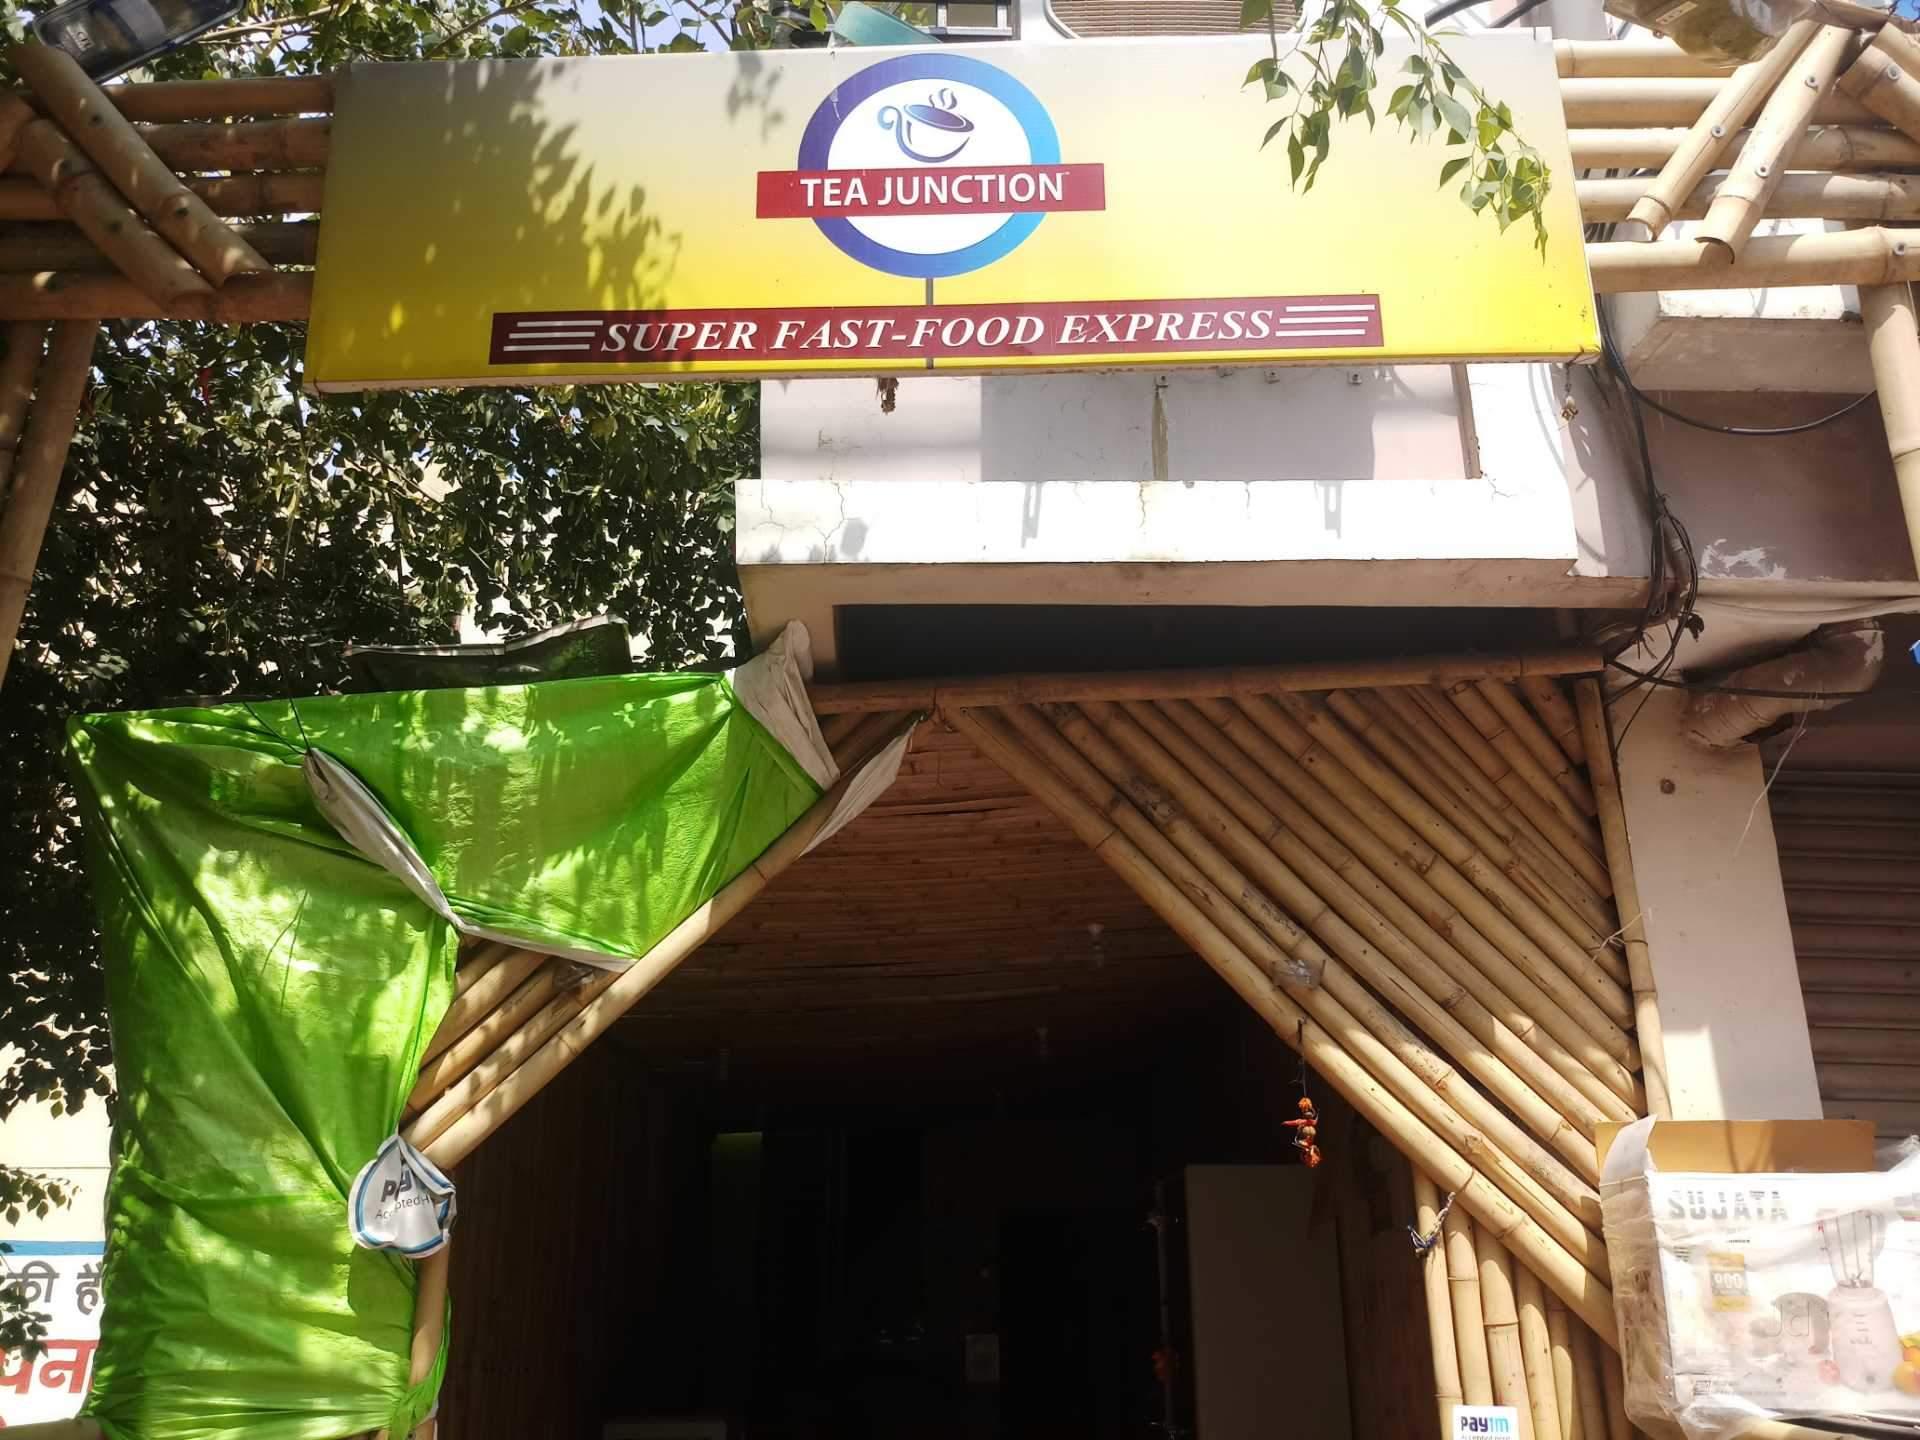 Artreess Mahalaxmi Nagar Indore   Fast Food   Justdial 1920x1440